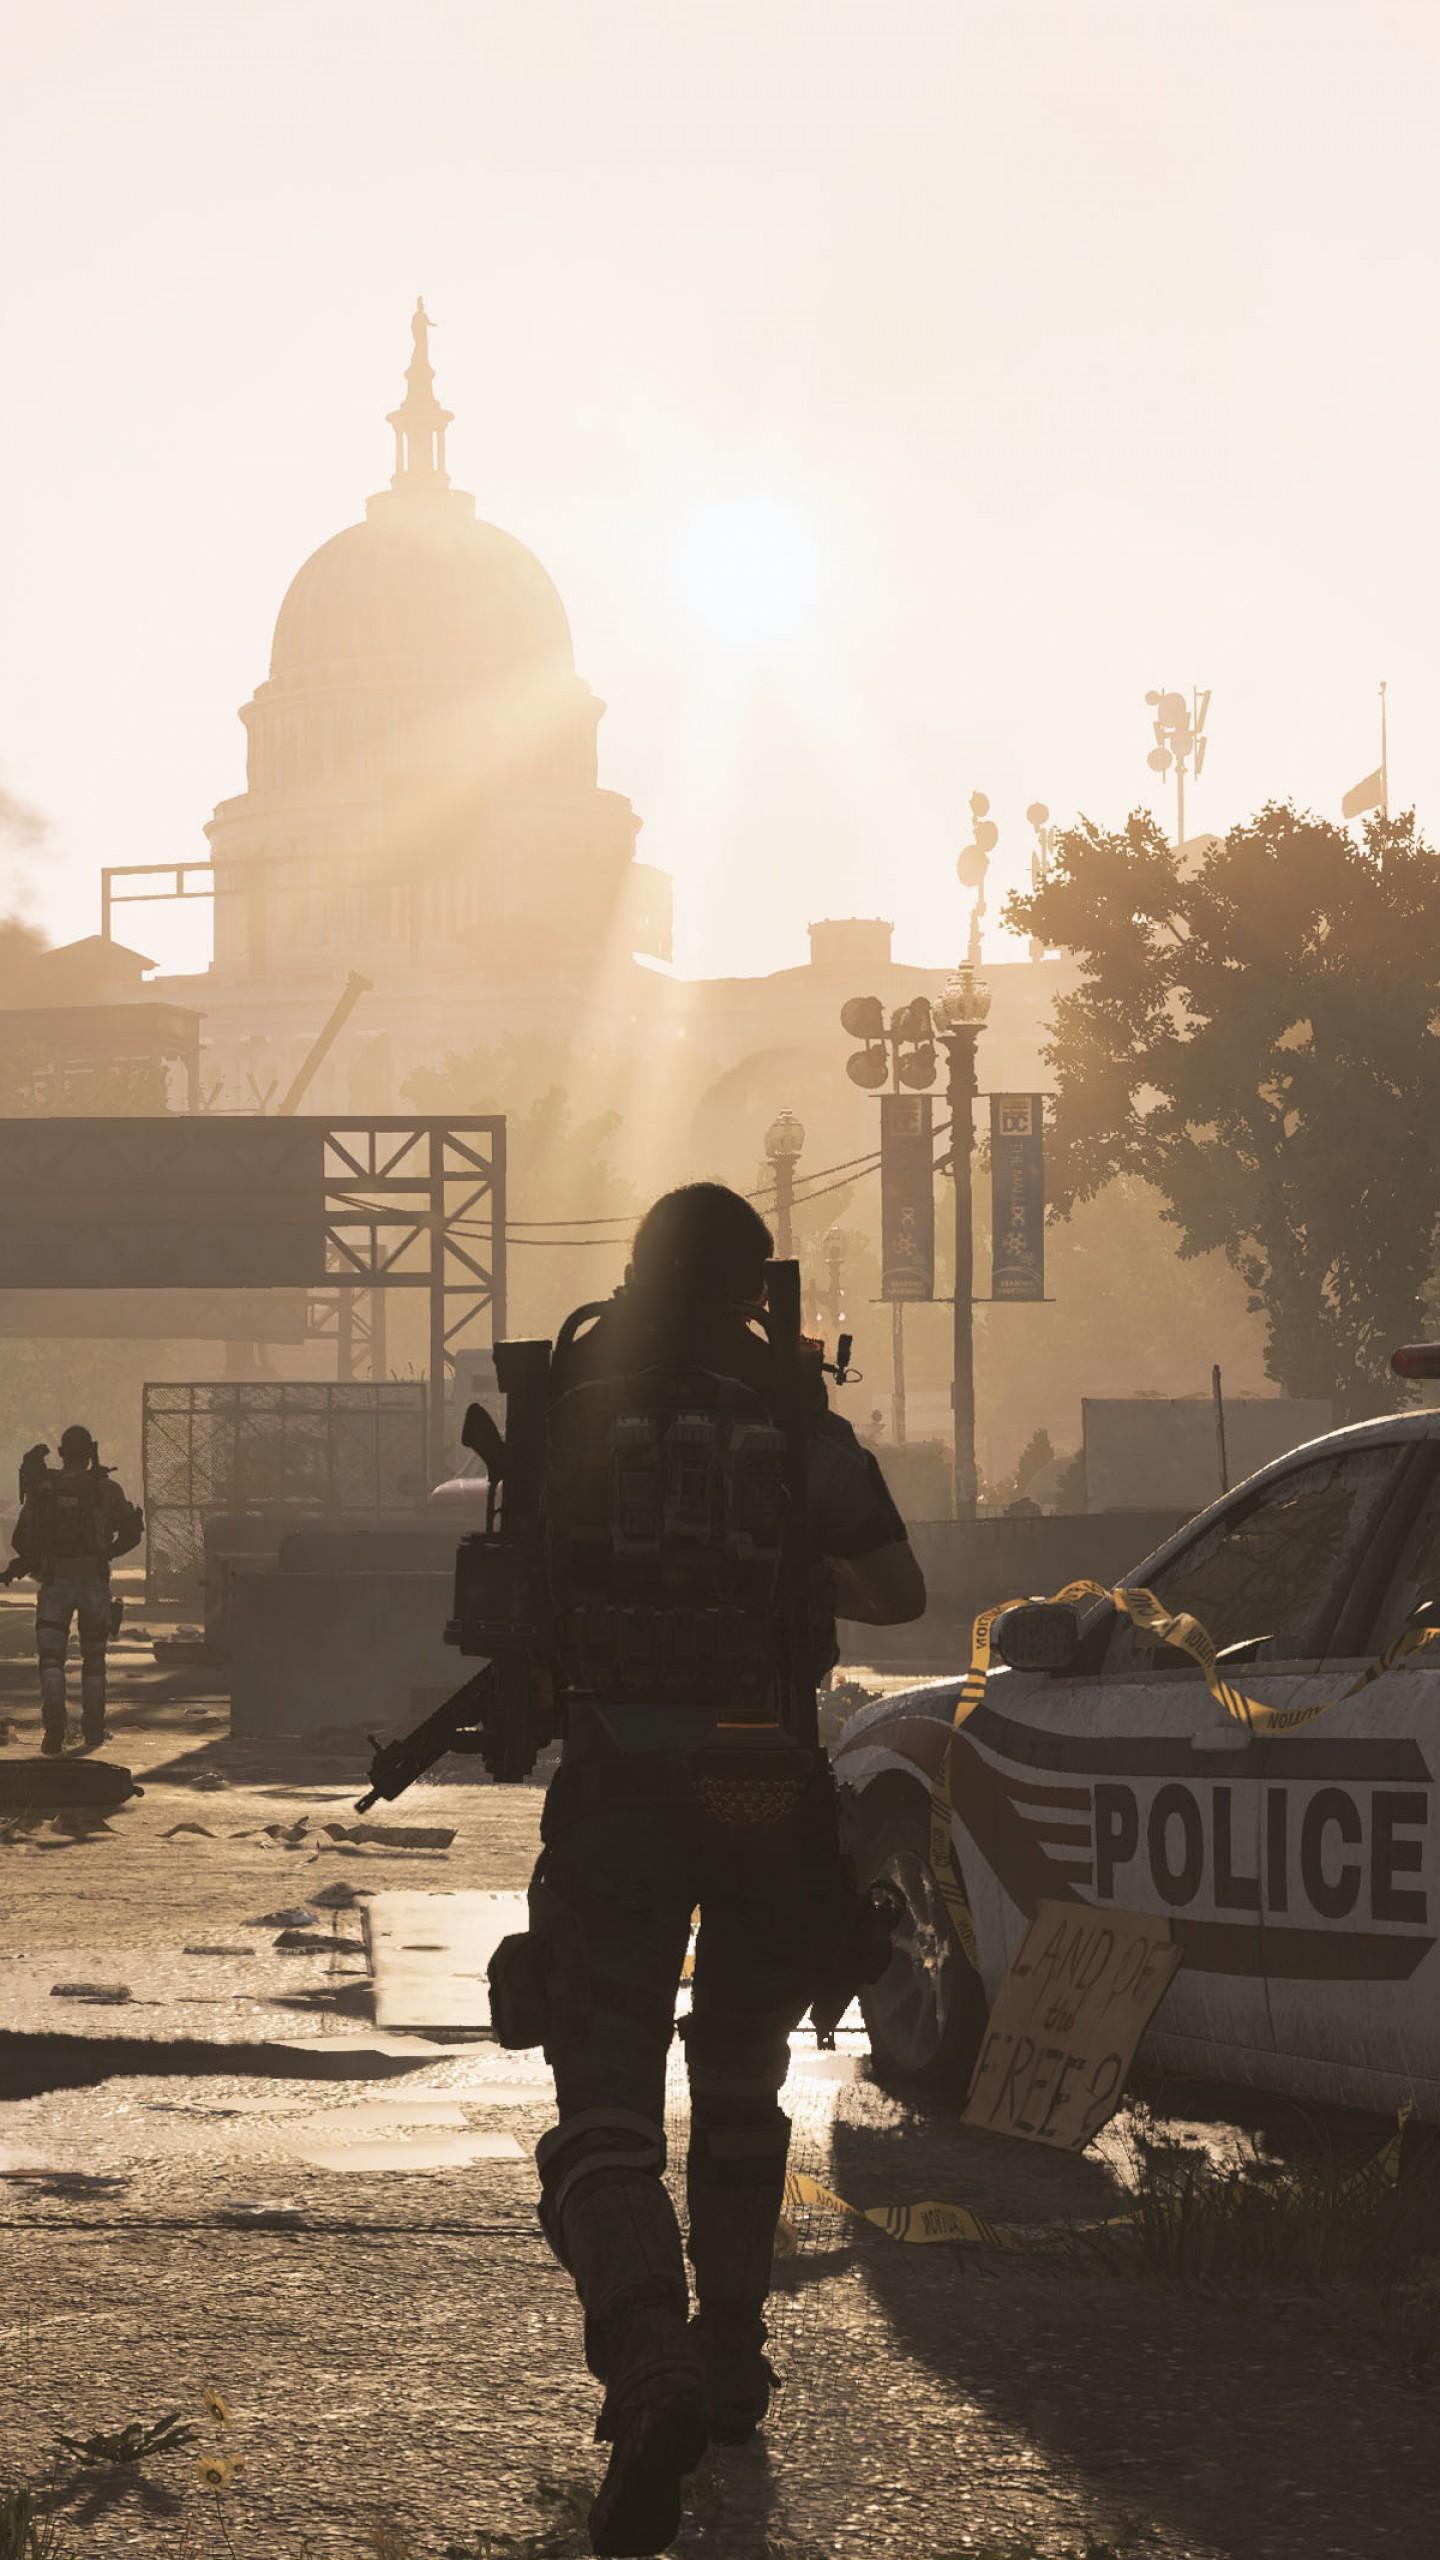 Wallpaper Tom Clancy's The Division 2, E3 2018, screenshot